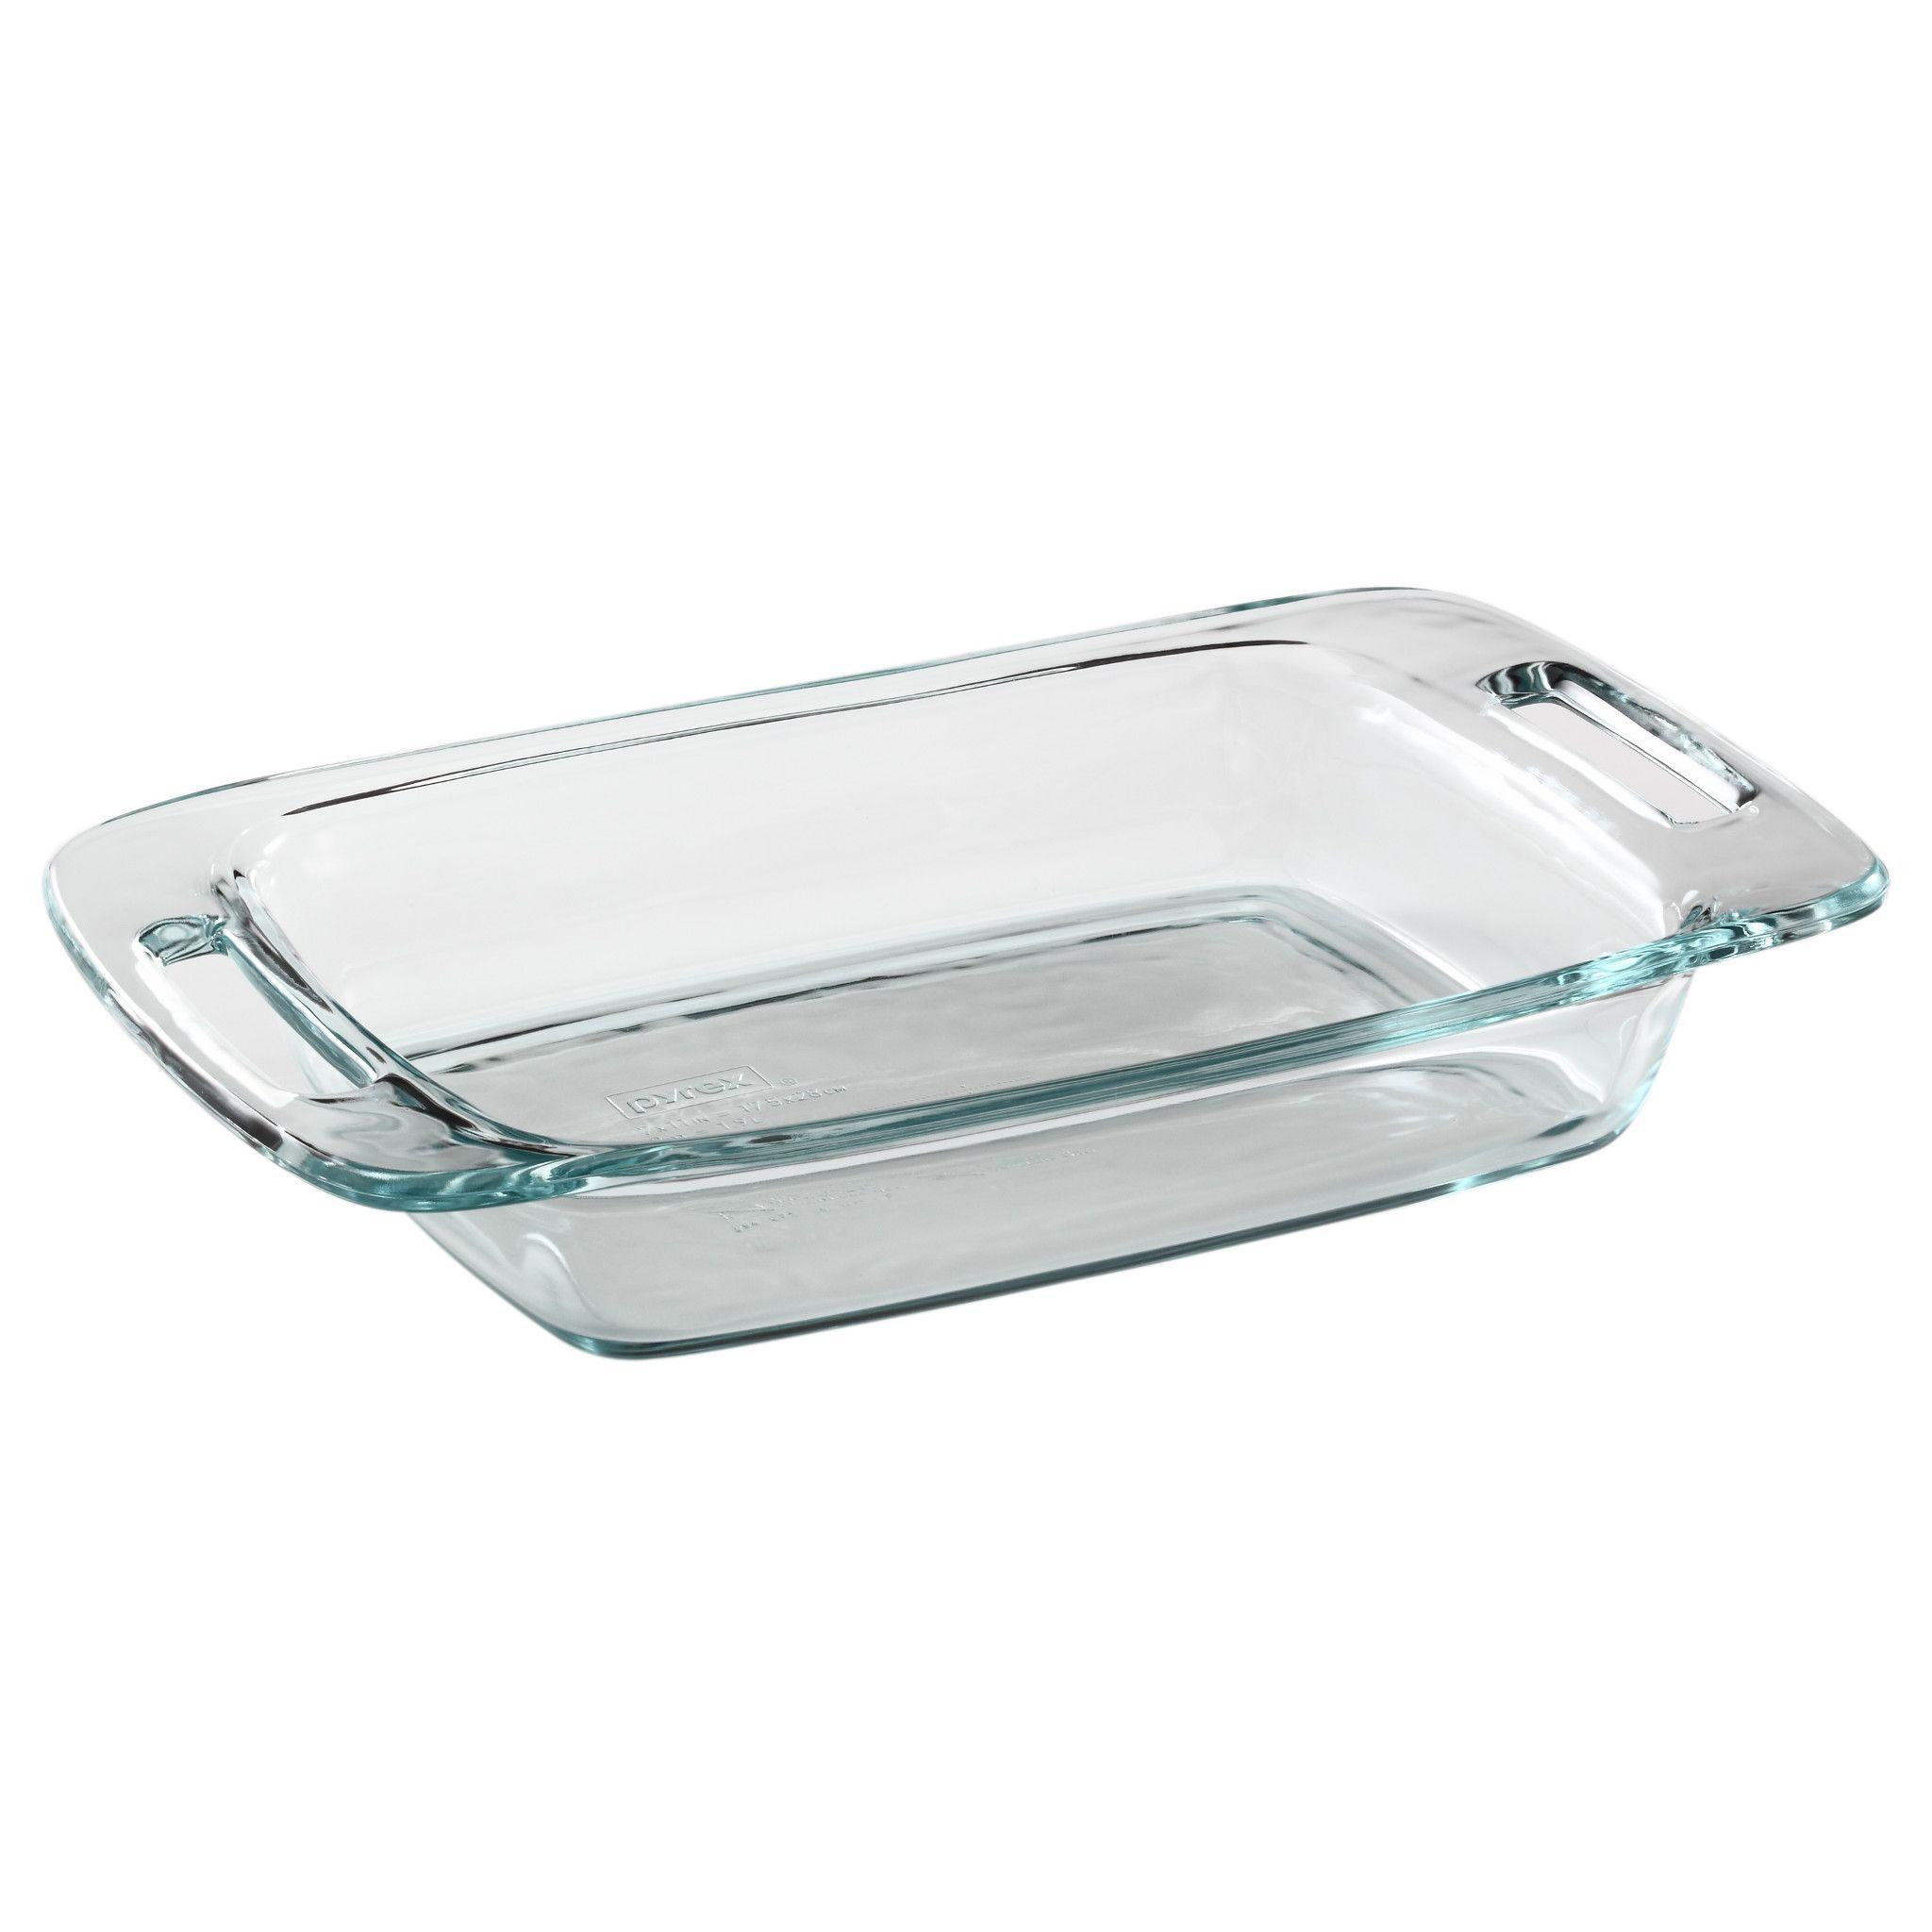 Pyrex Easy Grab 2-Qt Oblong Baking Dish